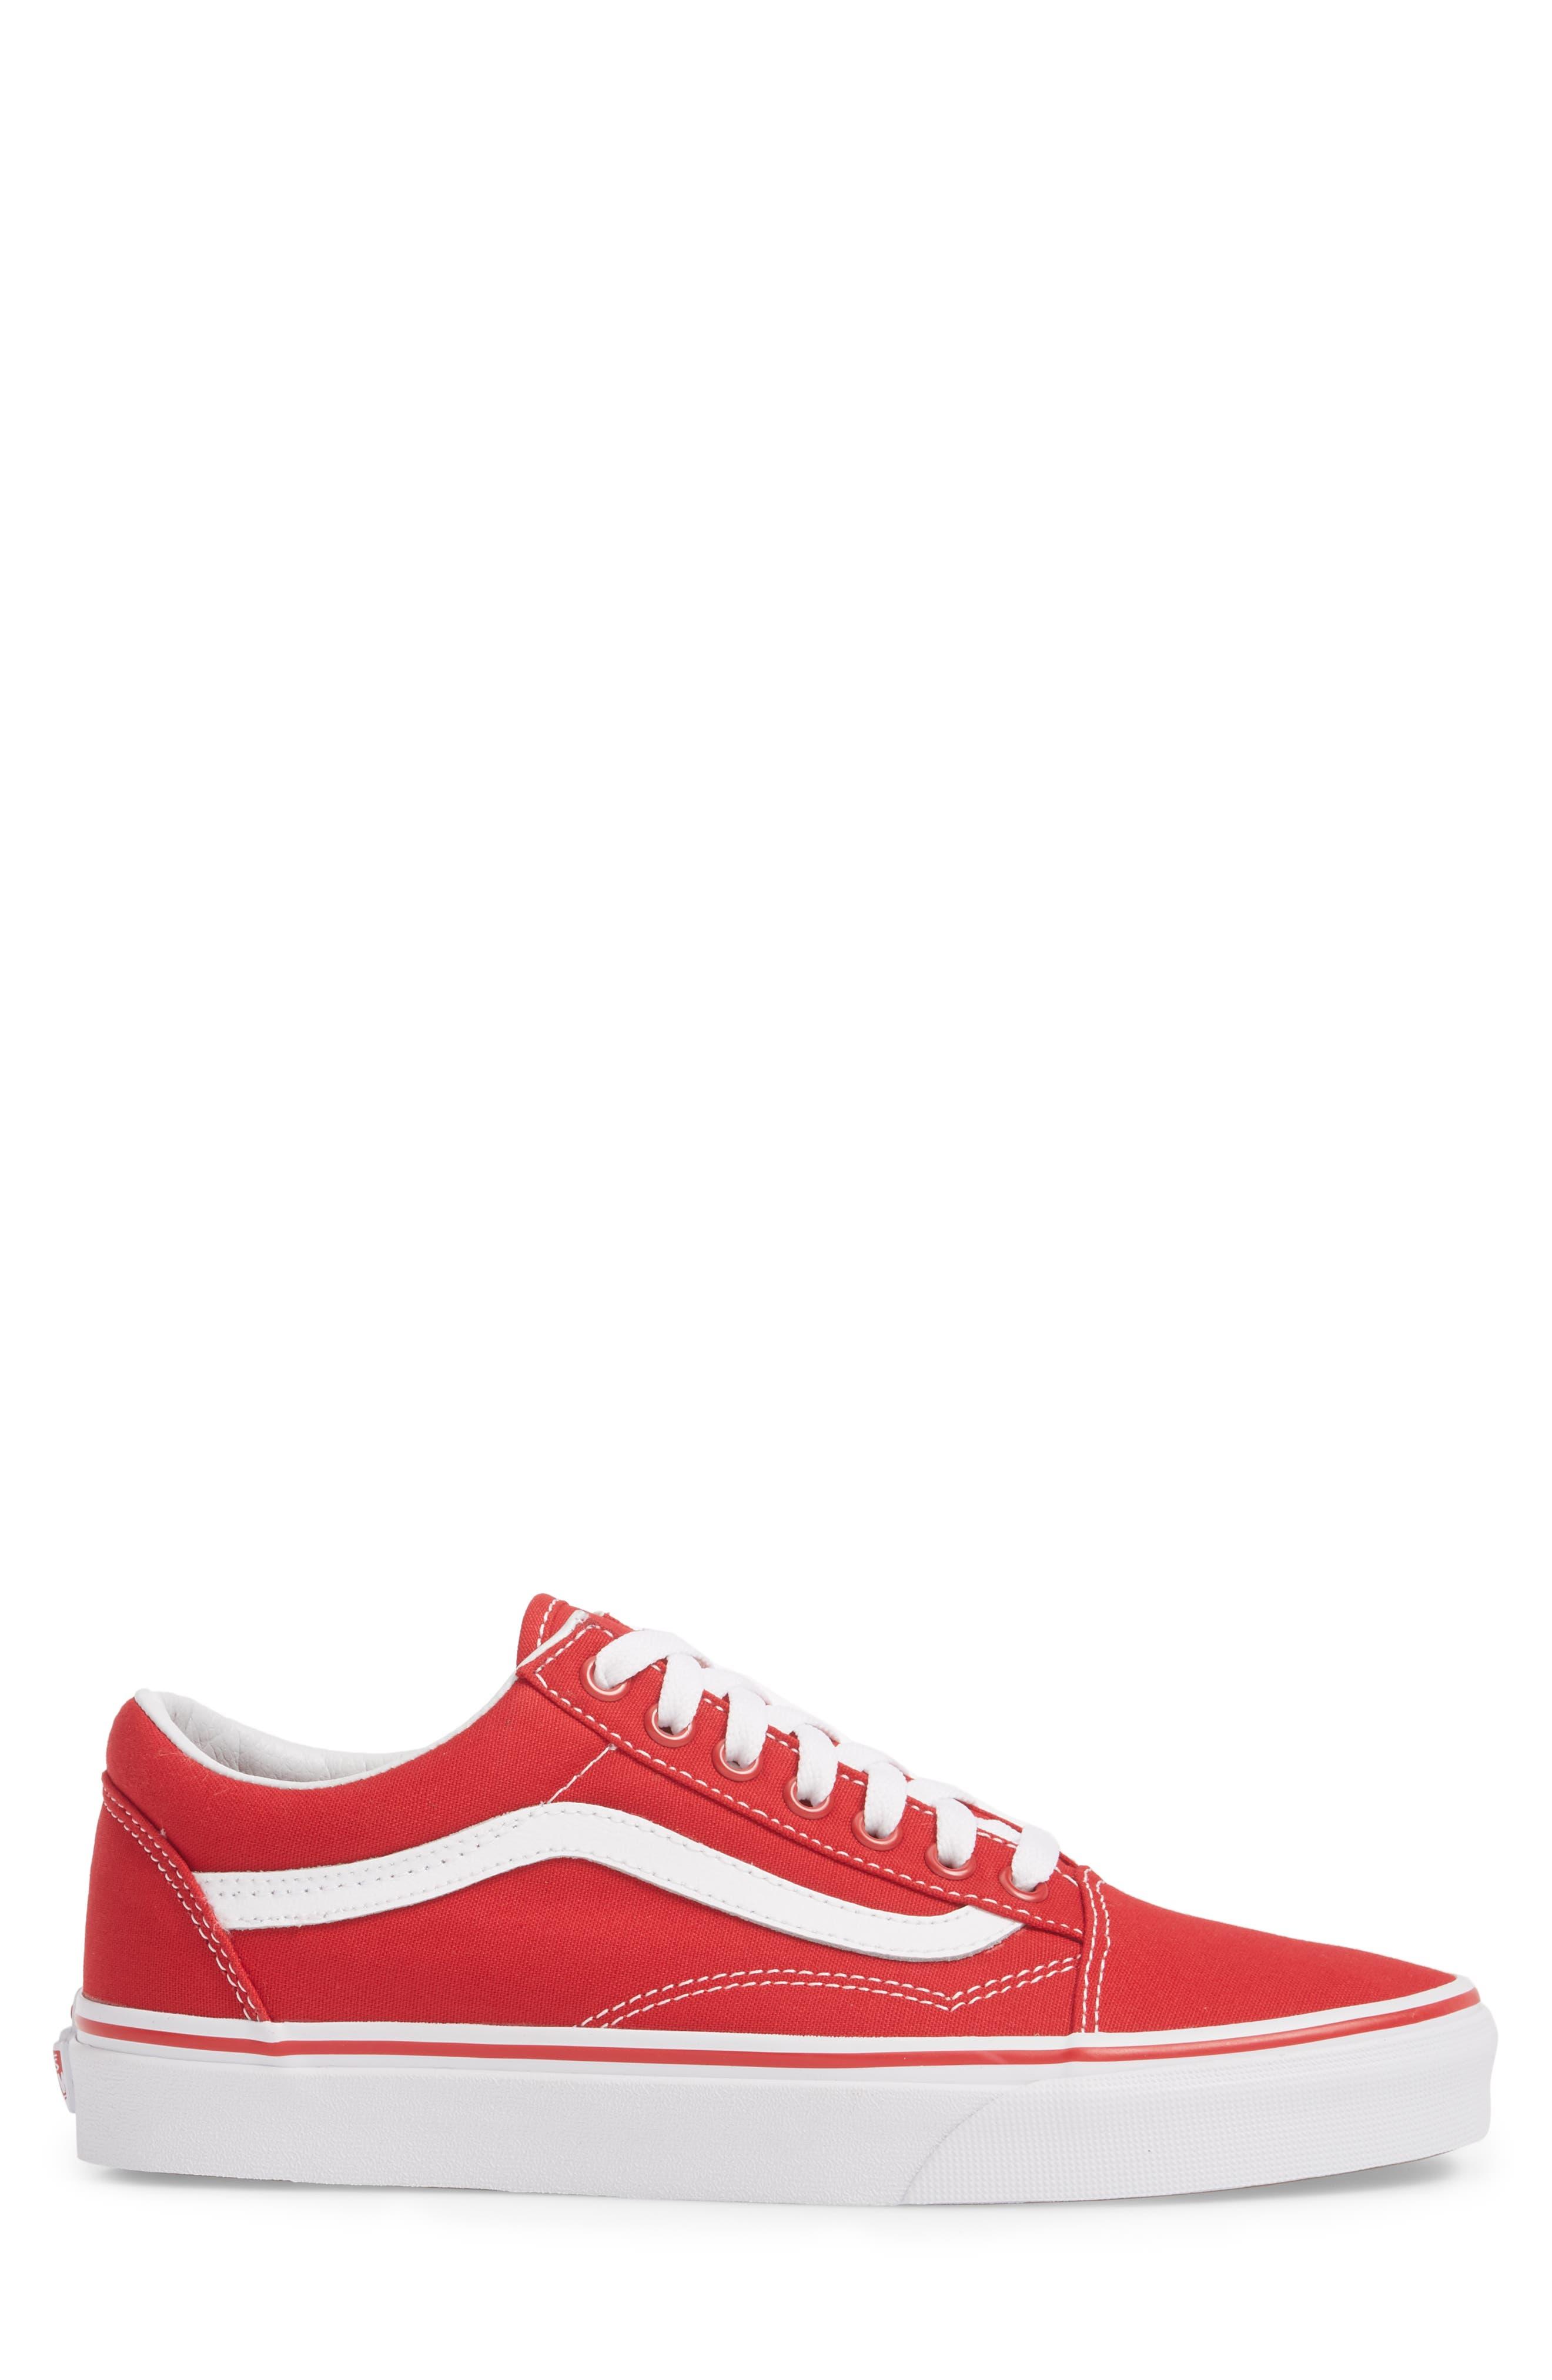 Old Skool Low Top Sneaker,                             Alternate thumbnail 3, color,                             Formula One Canvas